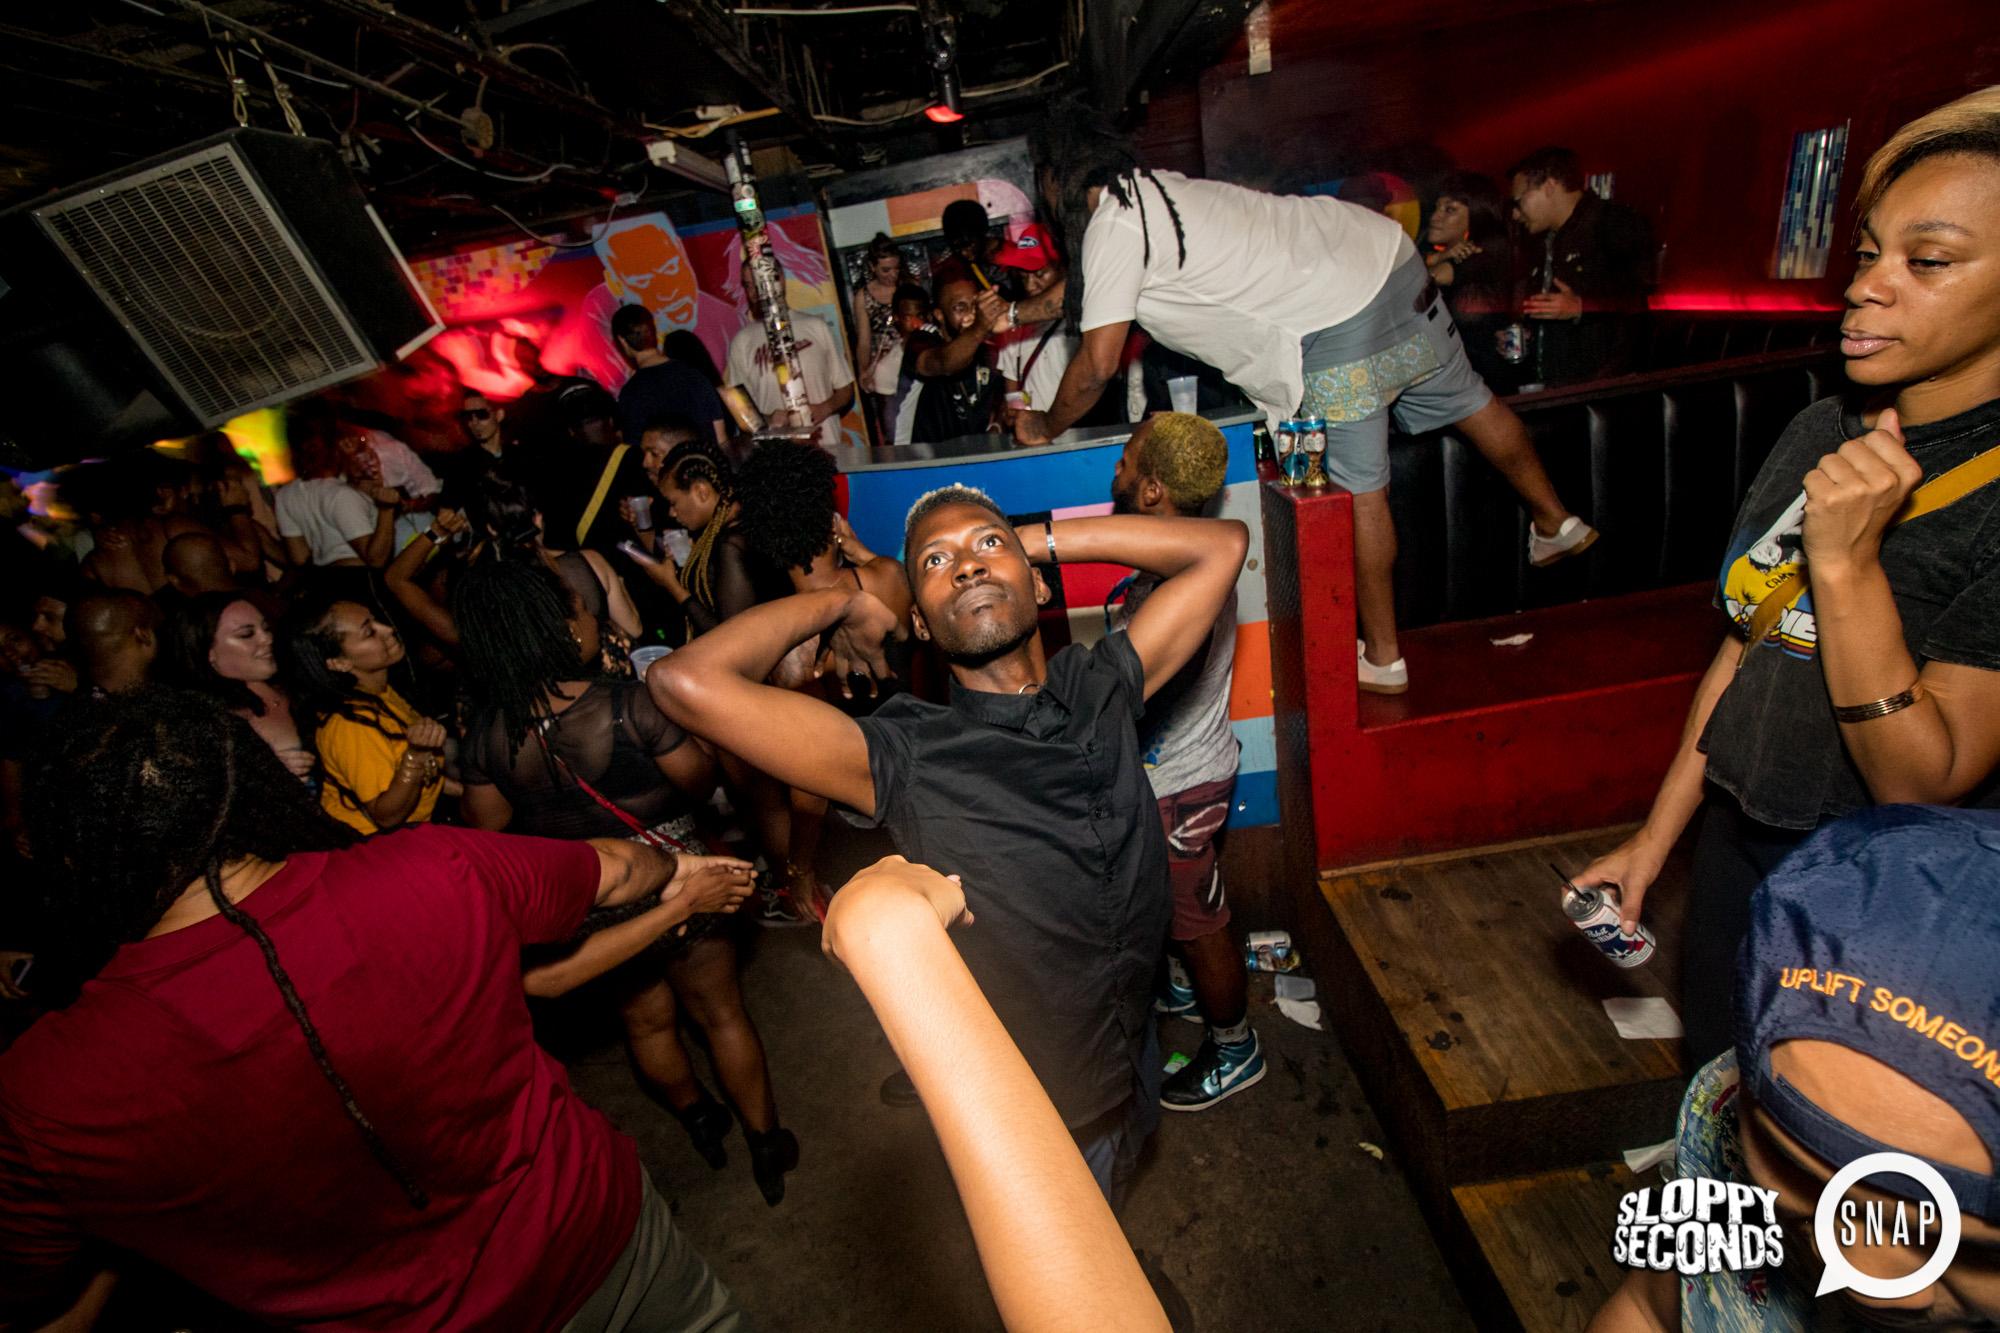 101Sloppy Seconds MJQ Atlanta Grace Kelly Oh Snap Kid.jpg